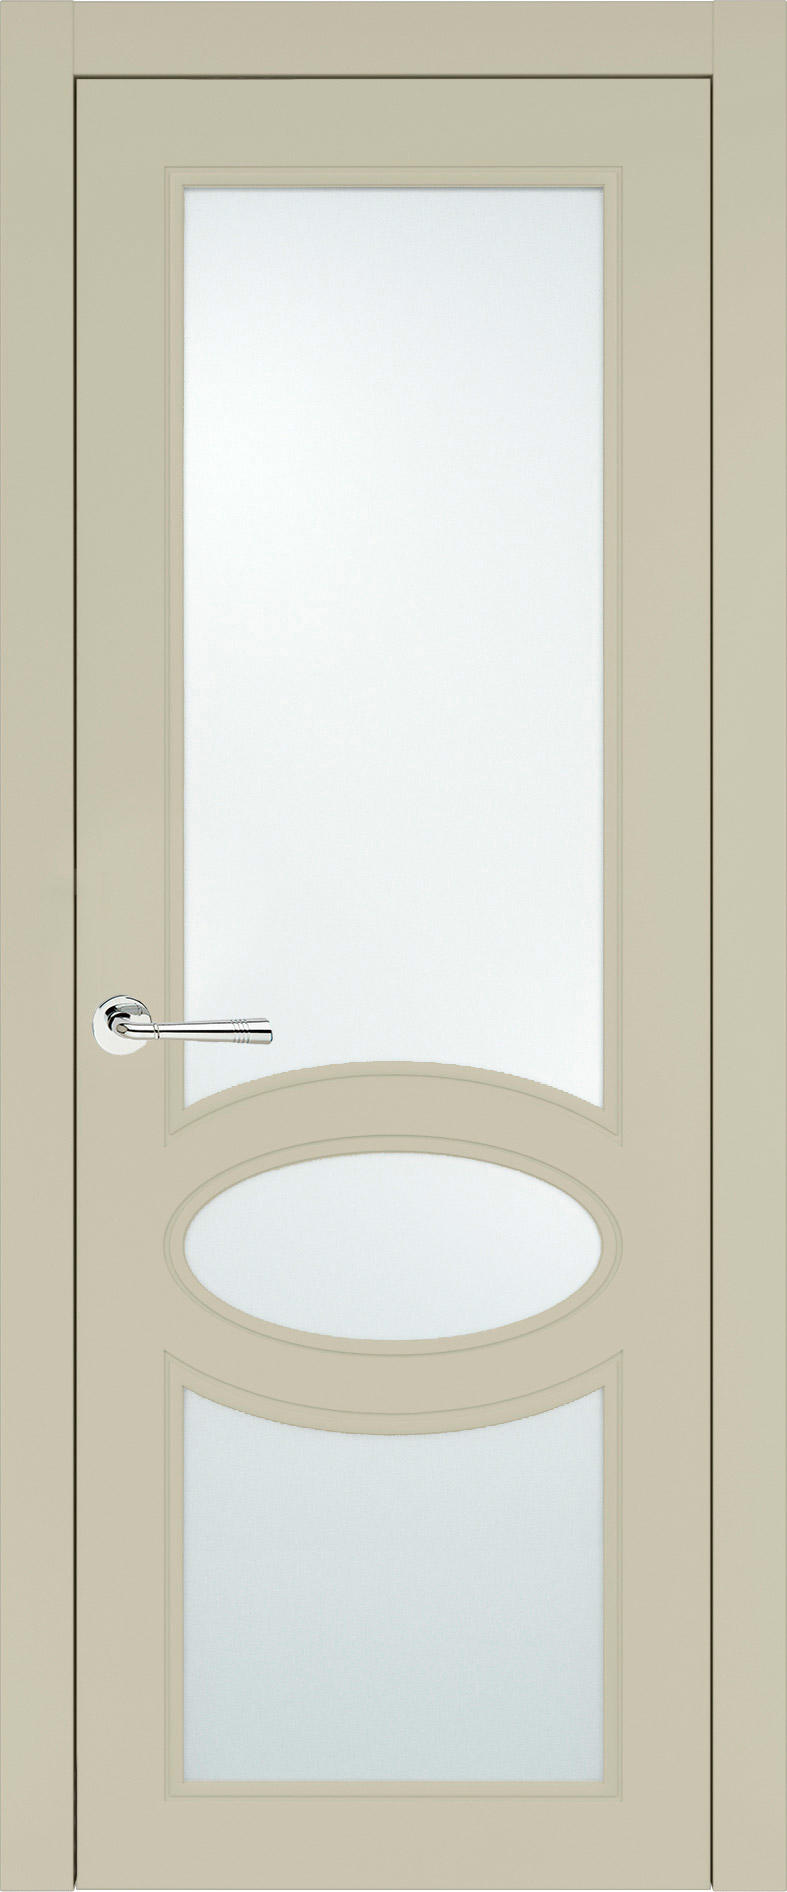 Florencia Neo Classic цвет - Серо-оливковая эмаль (RAL 7032) Со стеклом (ДО)